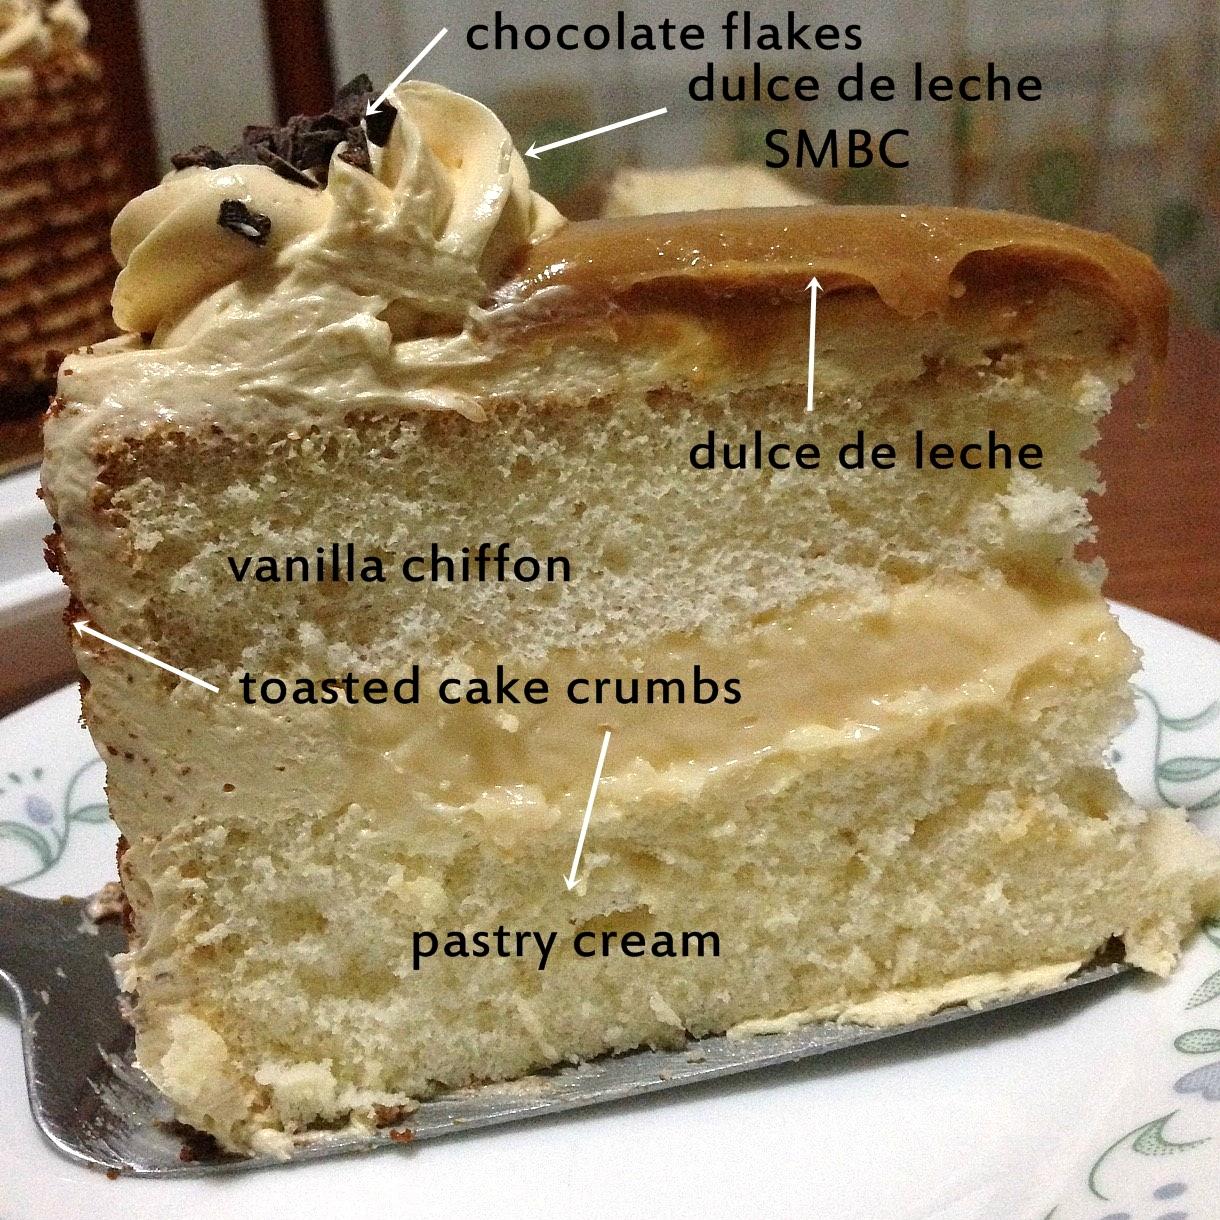 dulce de leche cake filling recipe